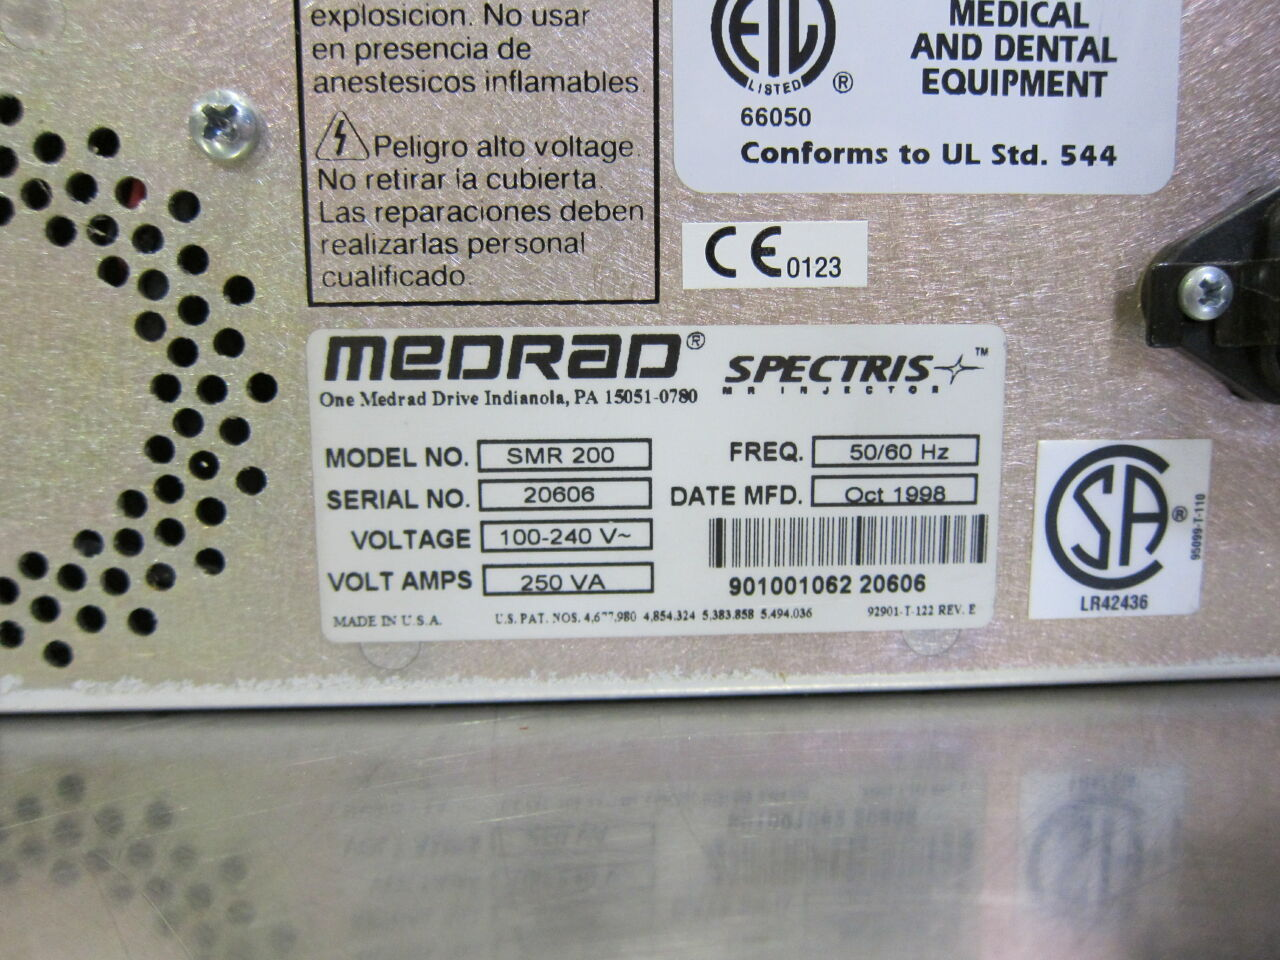 MEDRAD Spectris Injector MRI